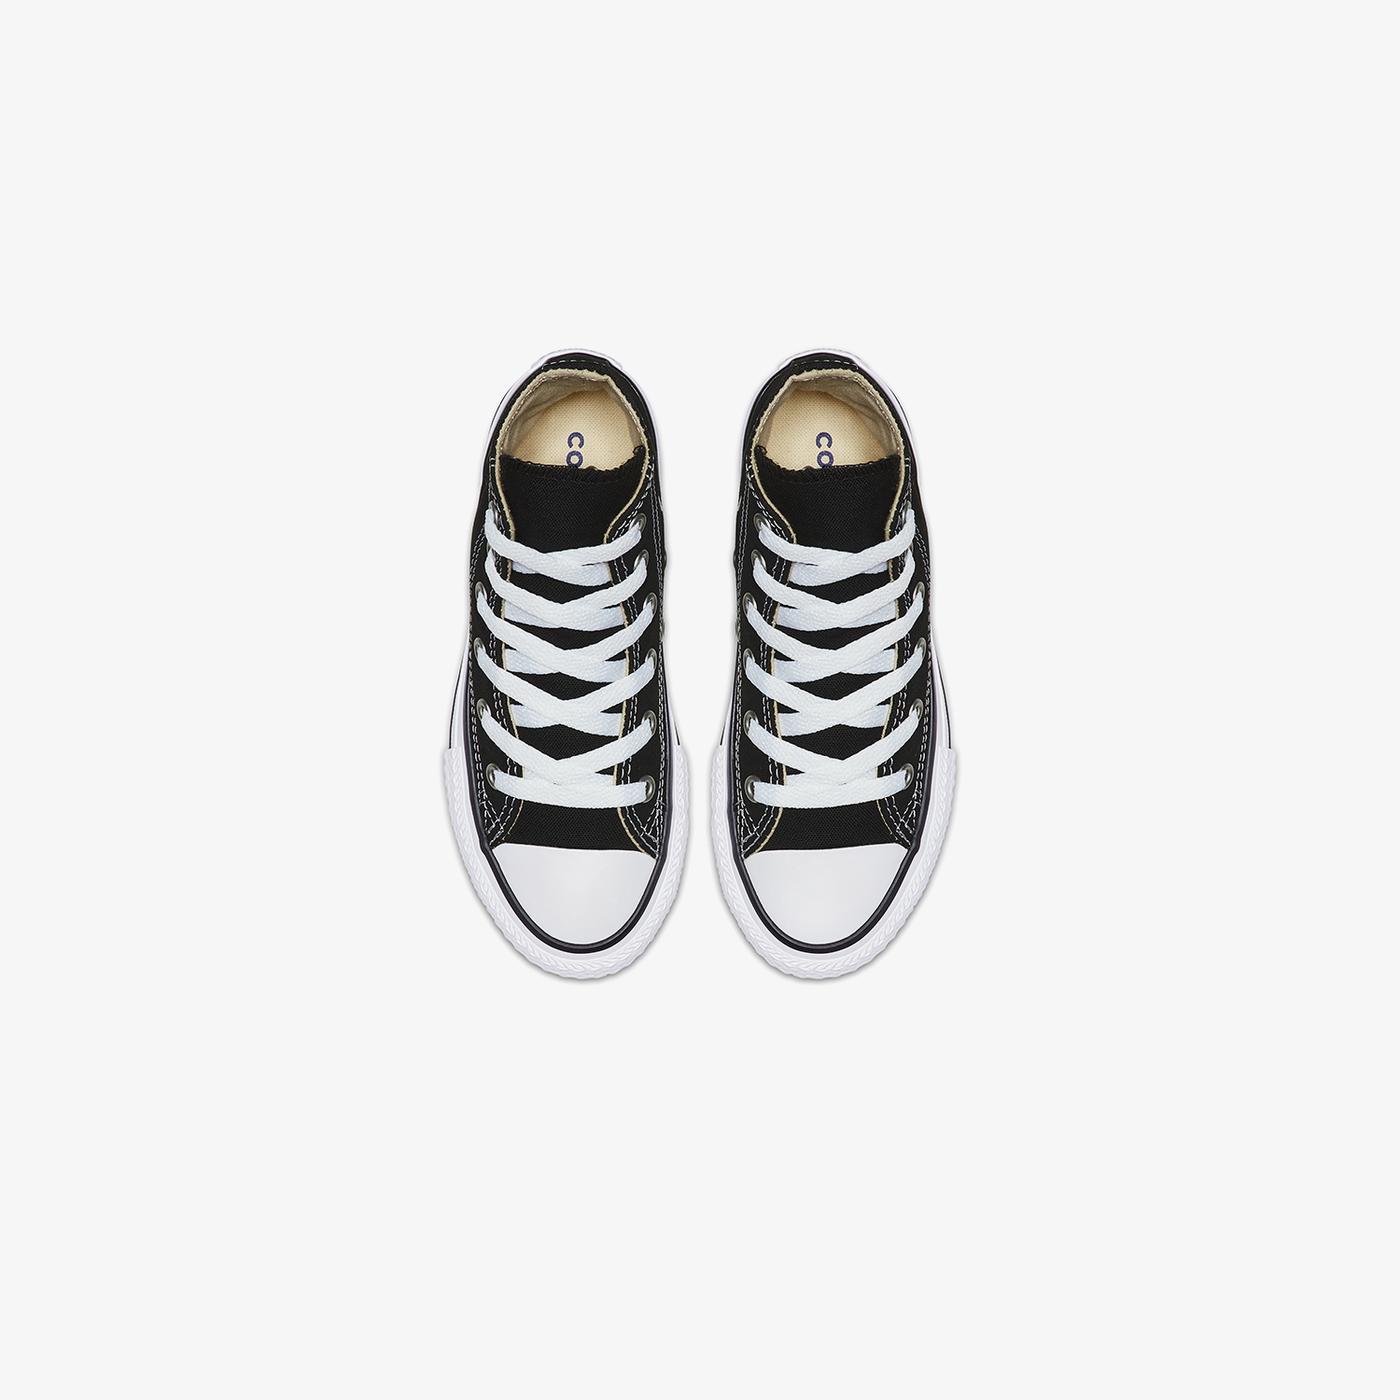 Converse Chuck Taylor All Star Hi Çocuk Siyah Sneaker